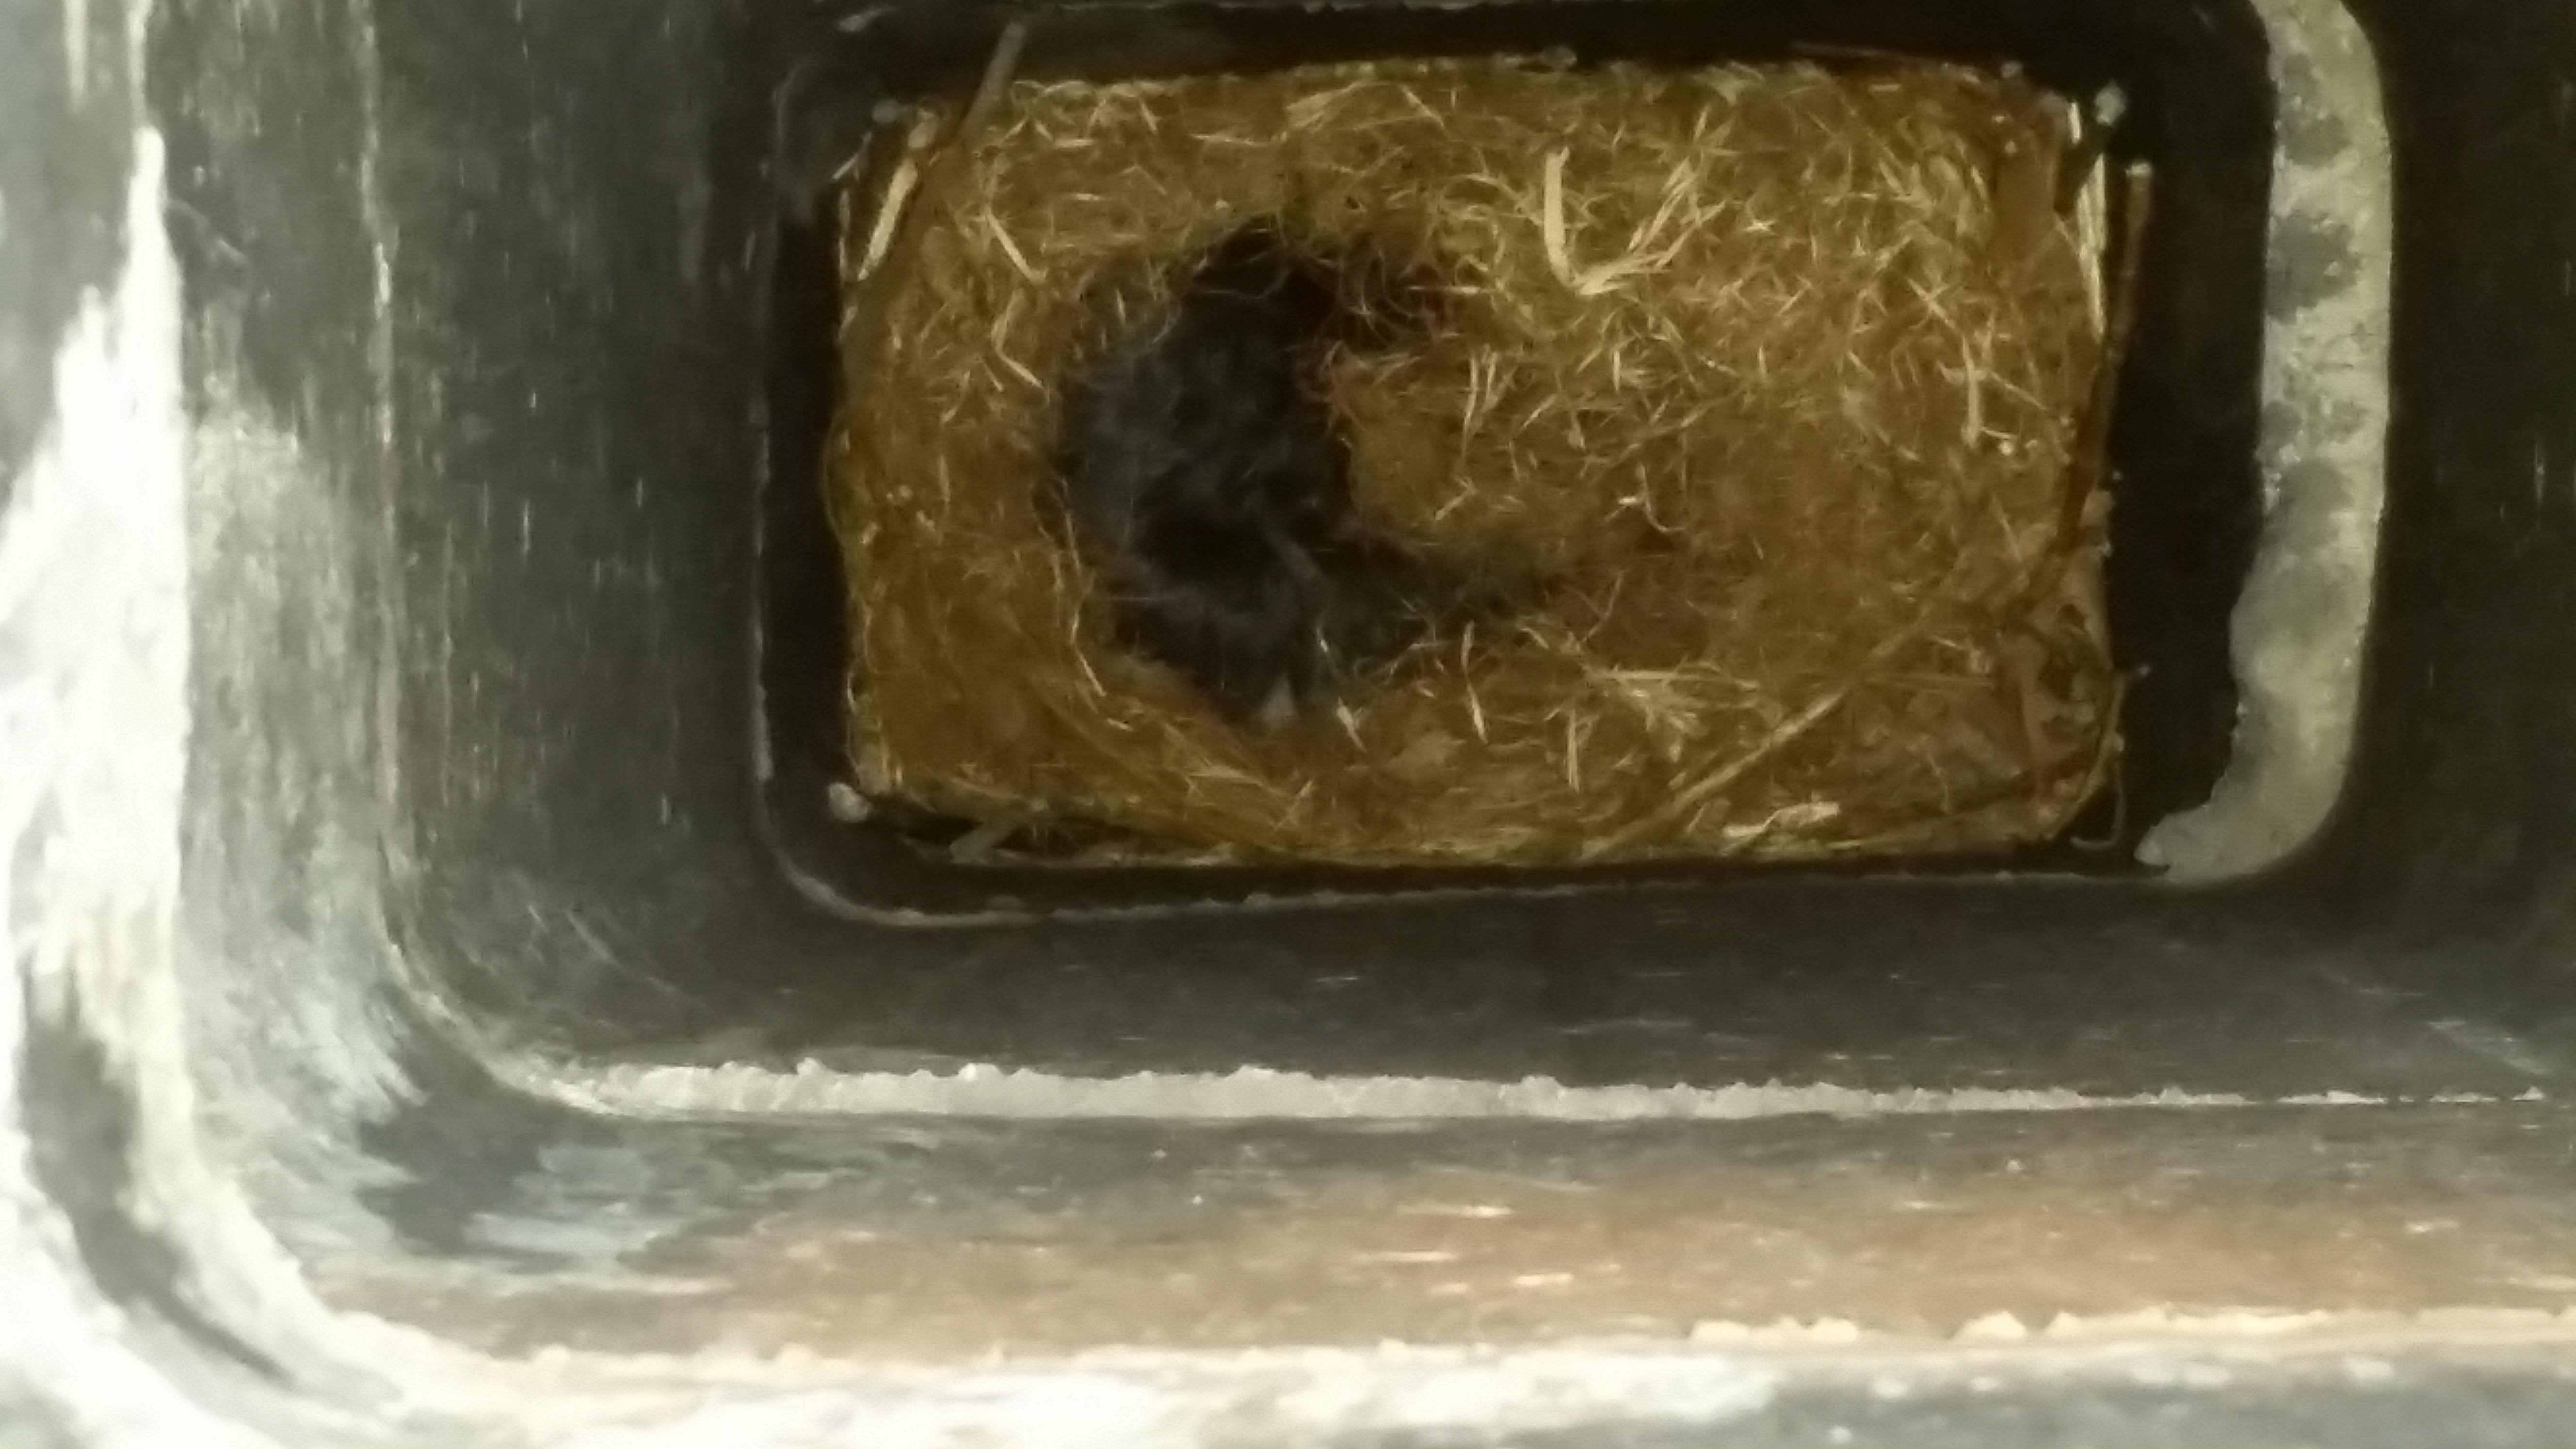 Squirrel Removal Control Birmingham Mi Michigan Bat Control Inc